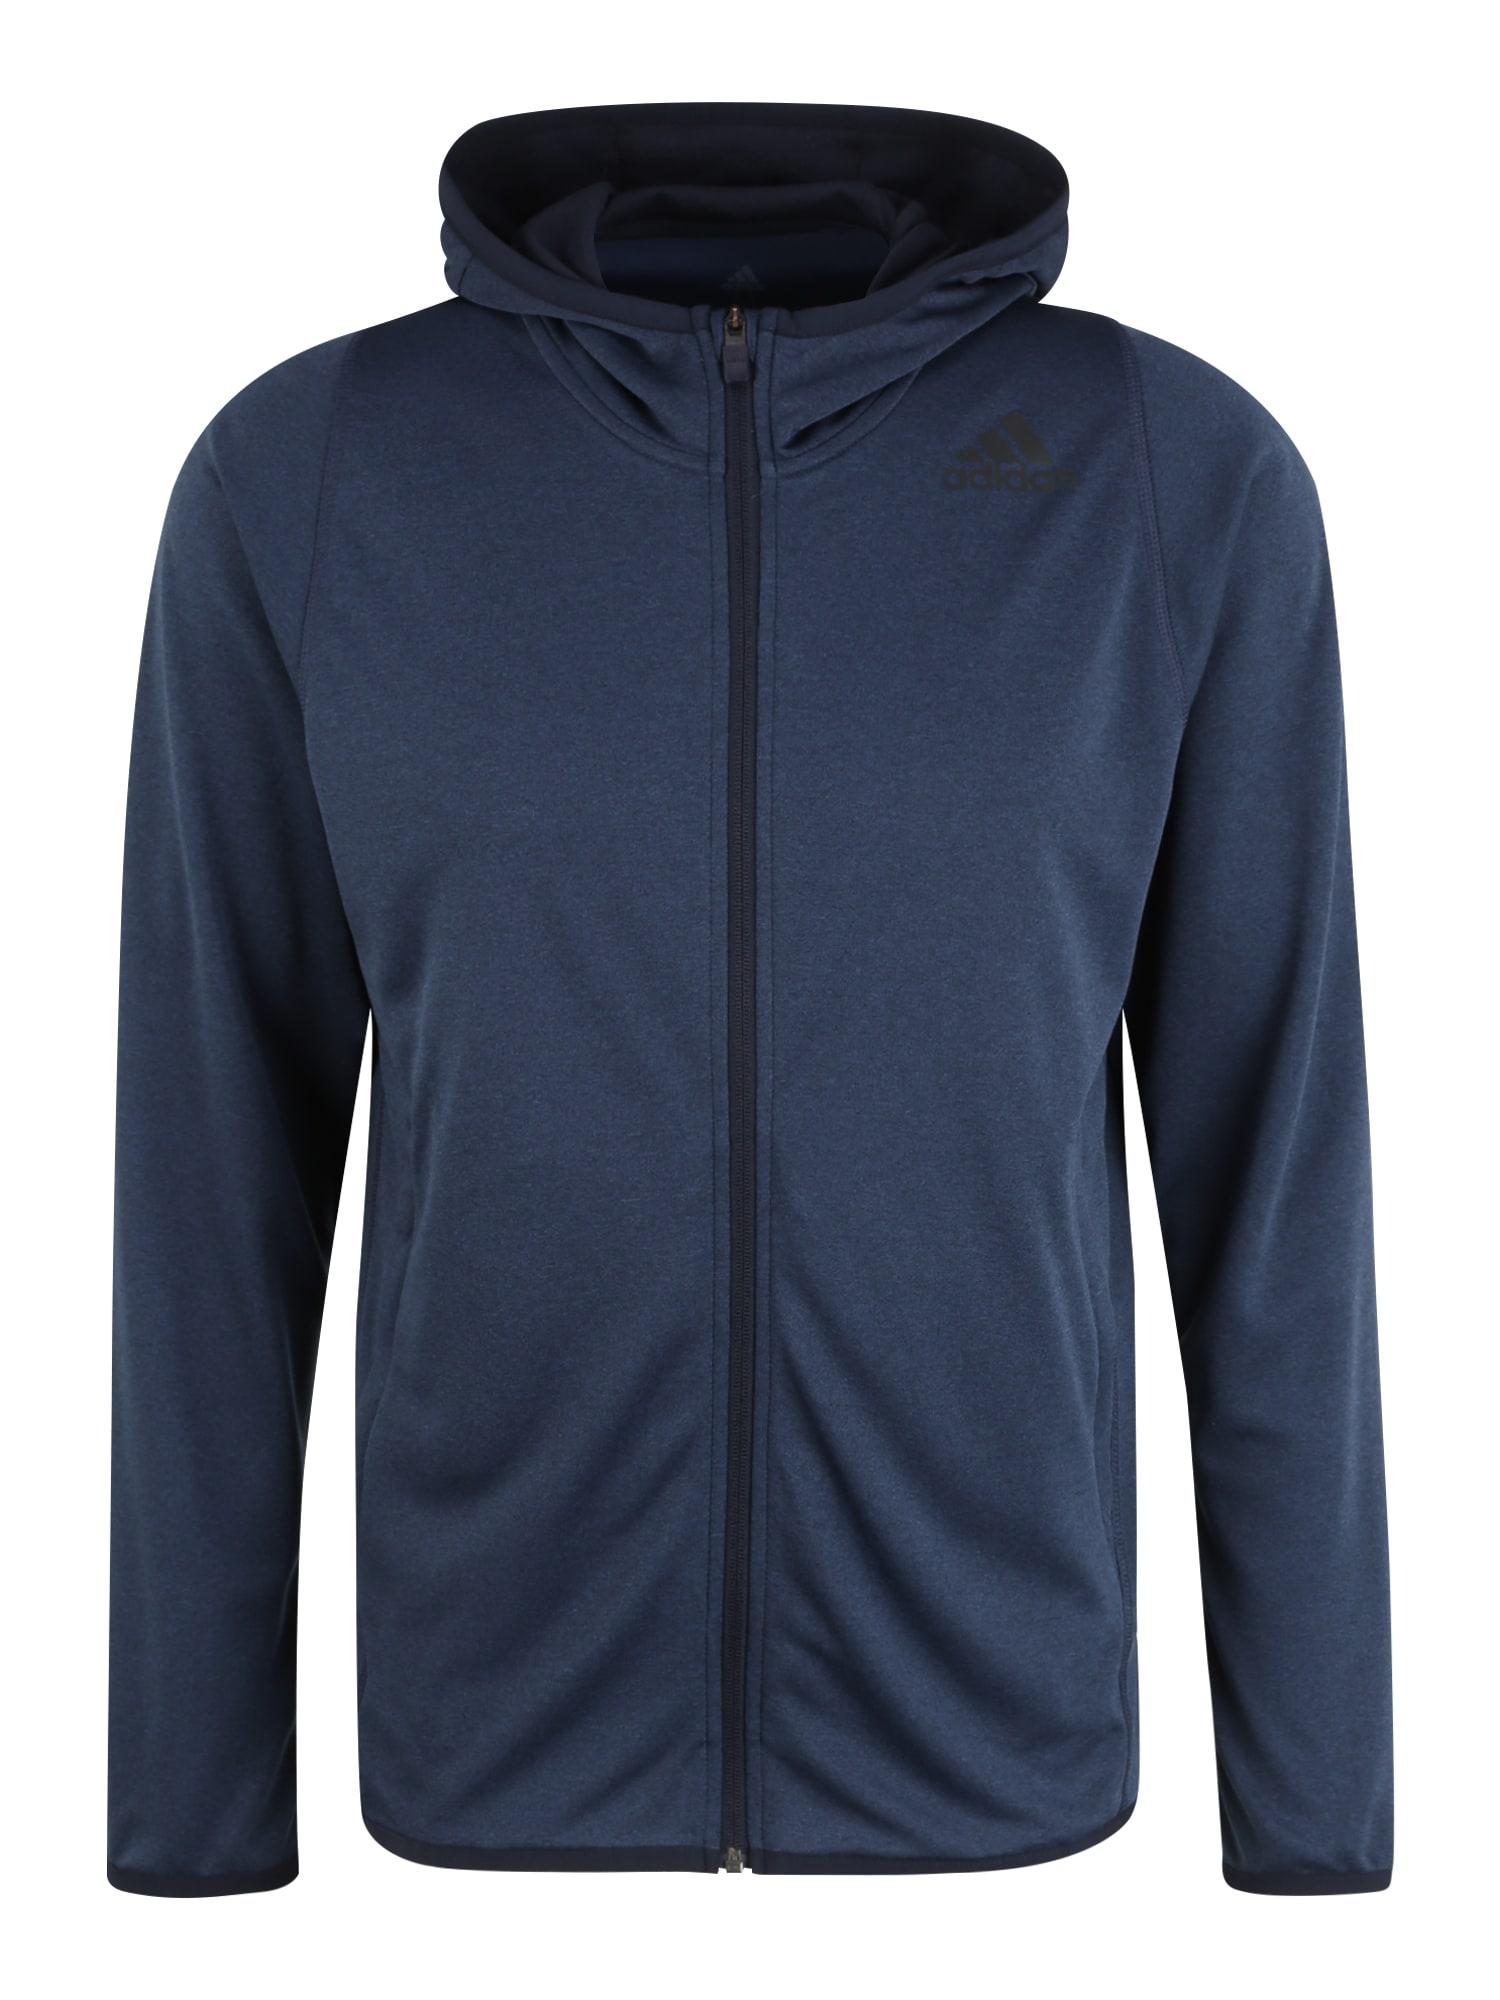 ADIDAS PERFORMANCE Sportinio tipo megztinis 'FL LITE FZ HDY' mėlyna